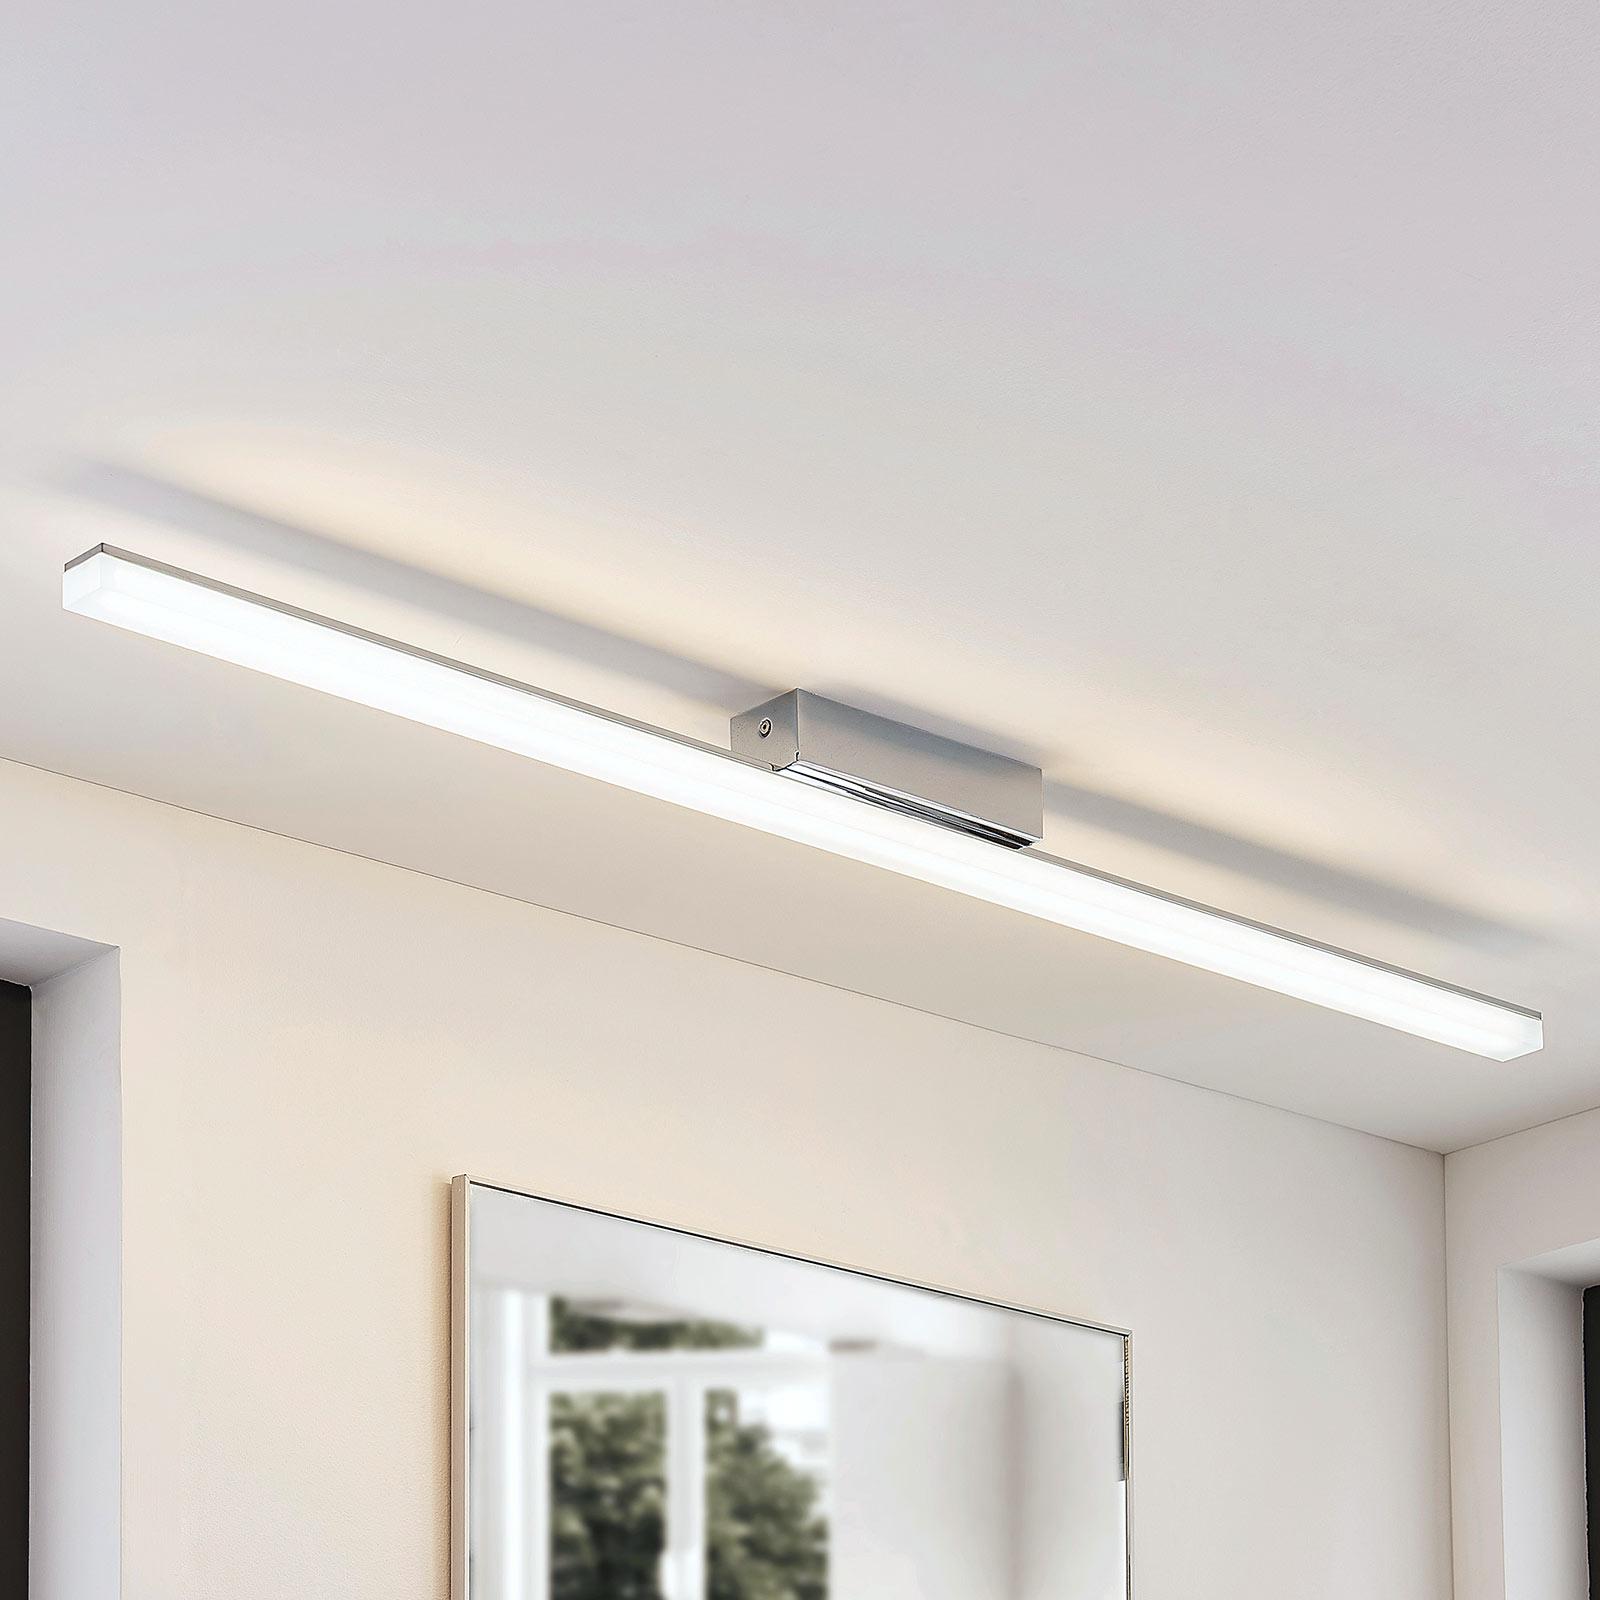 Podłużna lampa sufitowa LED Levke, IP44